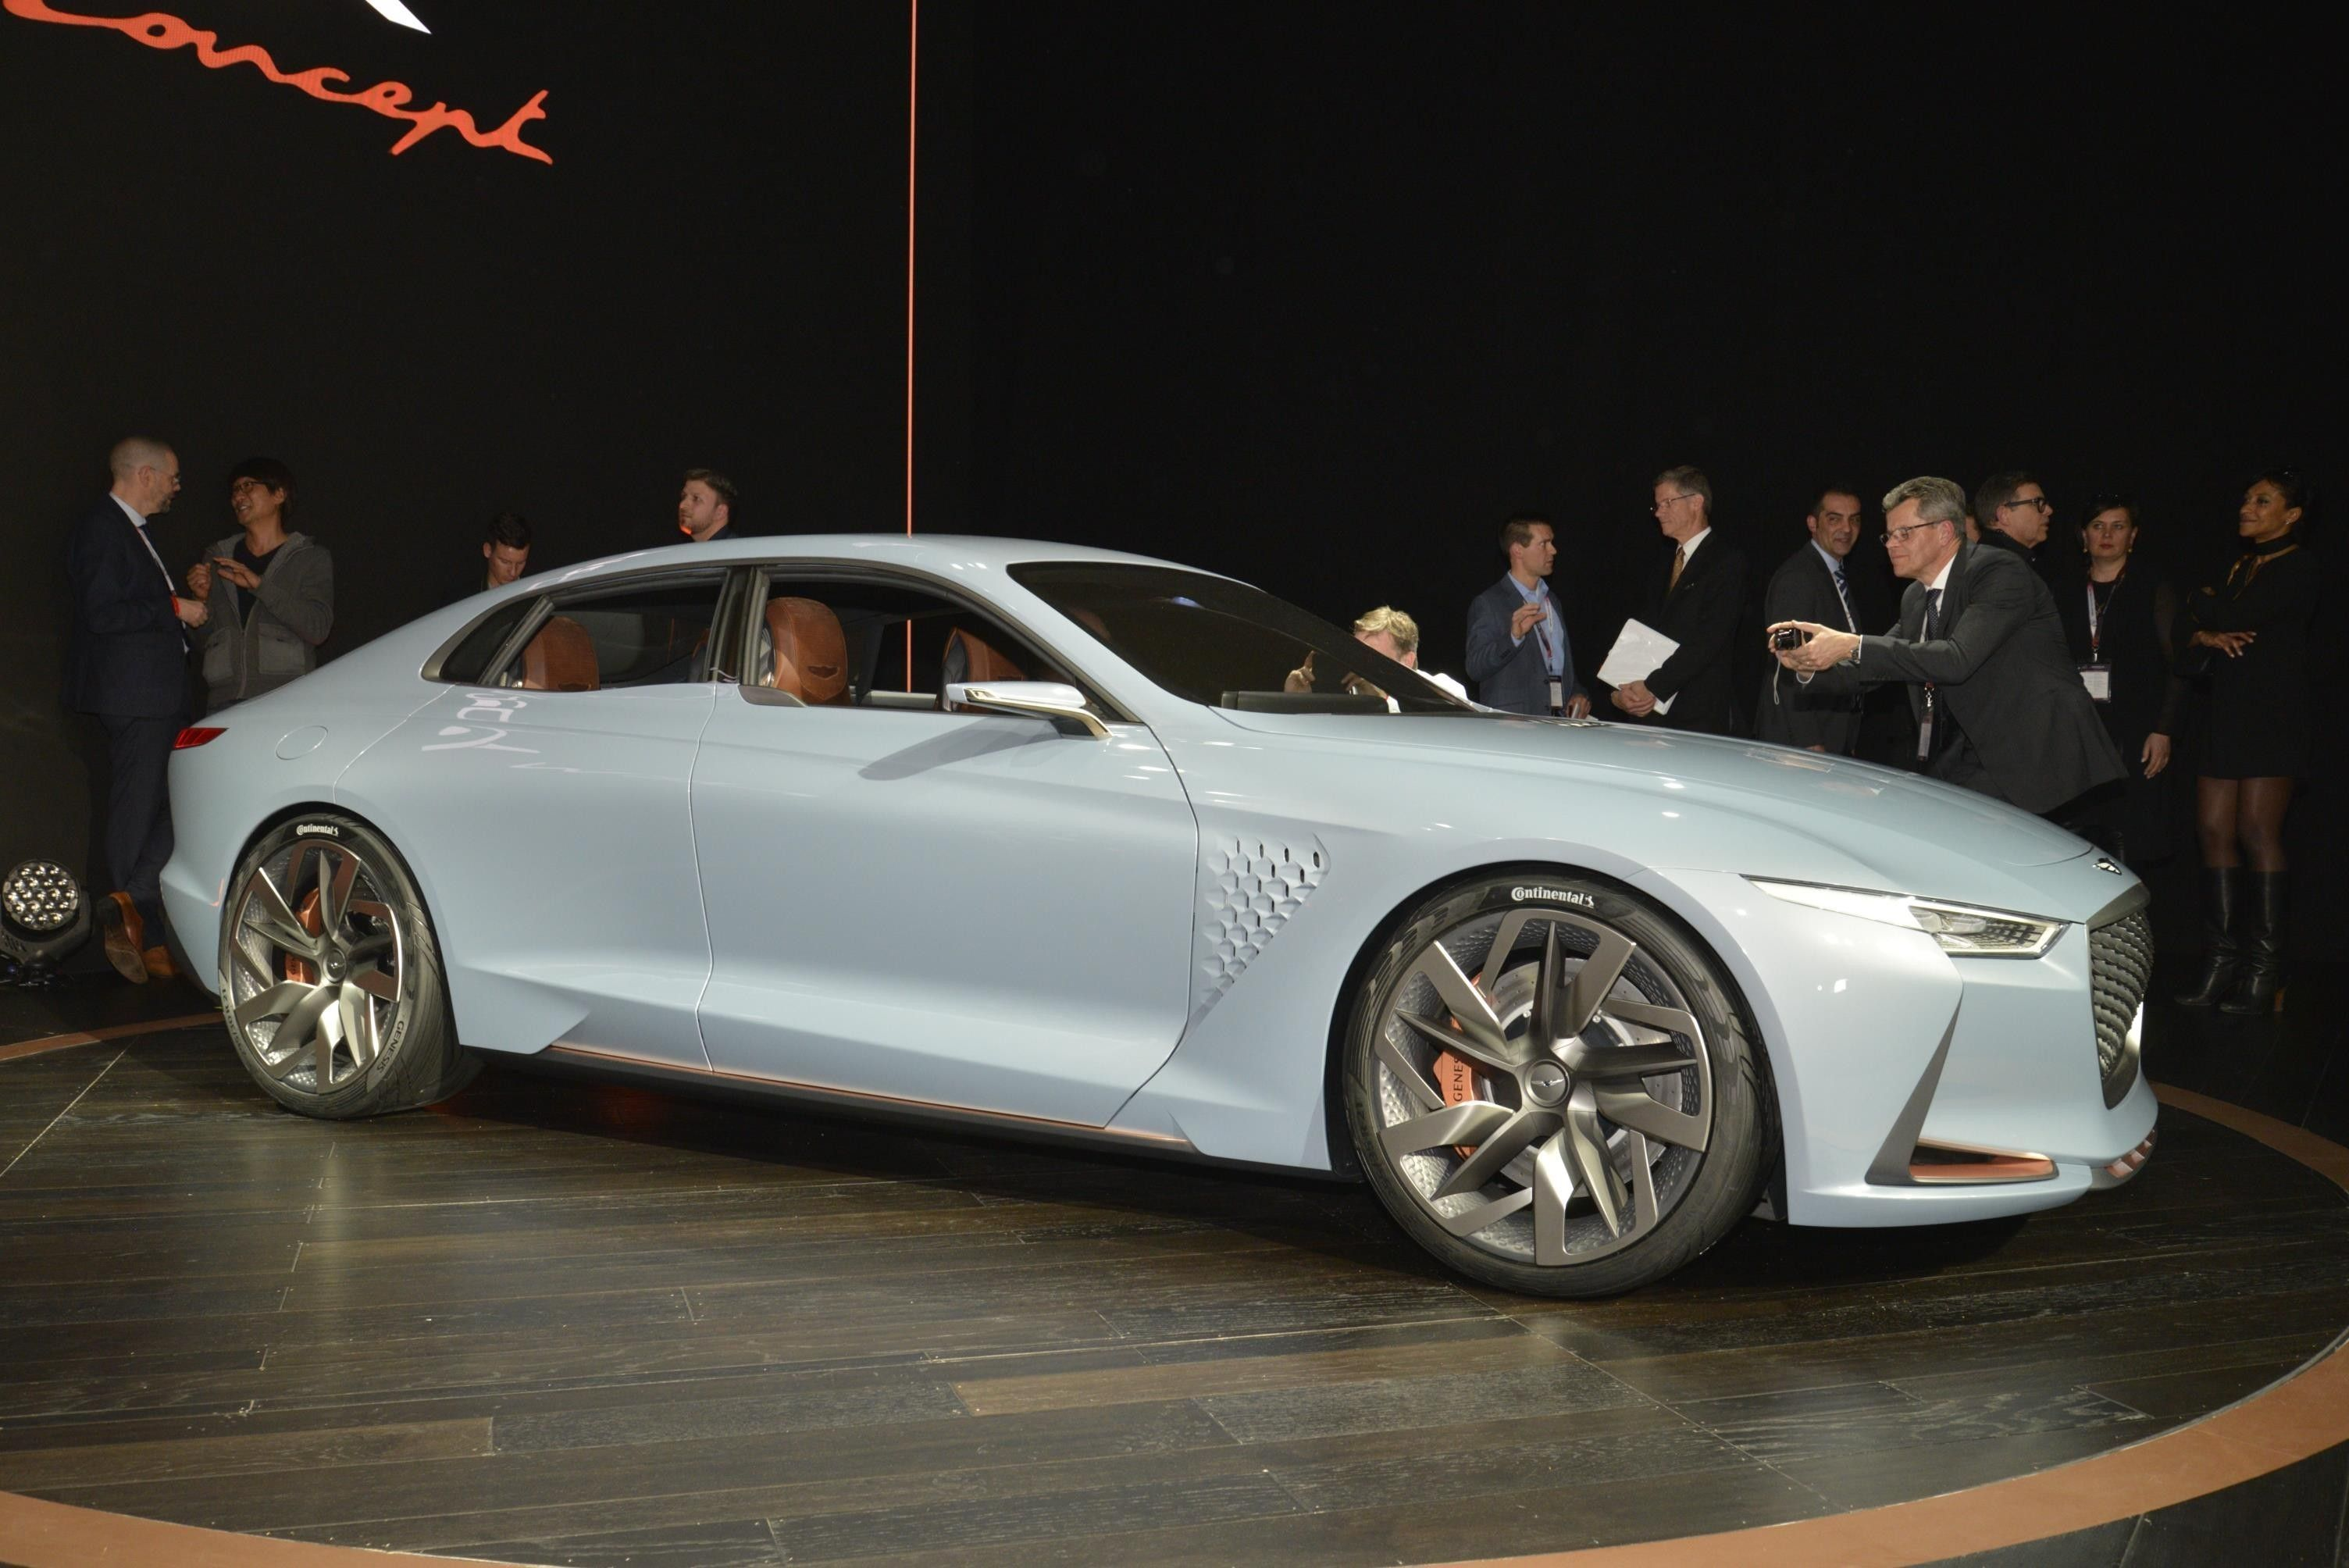 2020 Hyundai Equus Ultimate Performance and New Engine